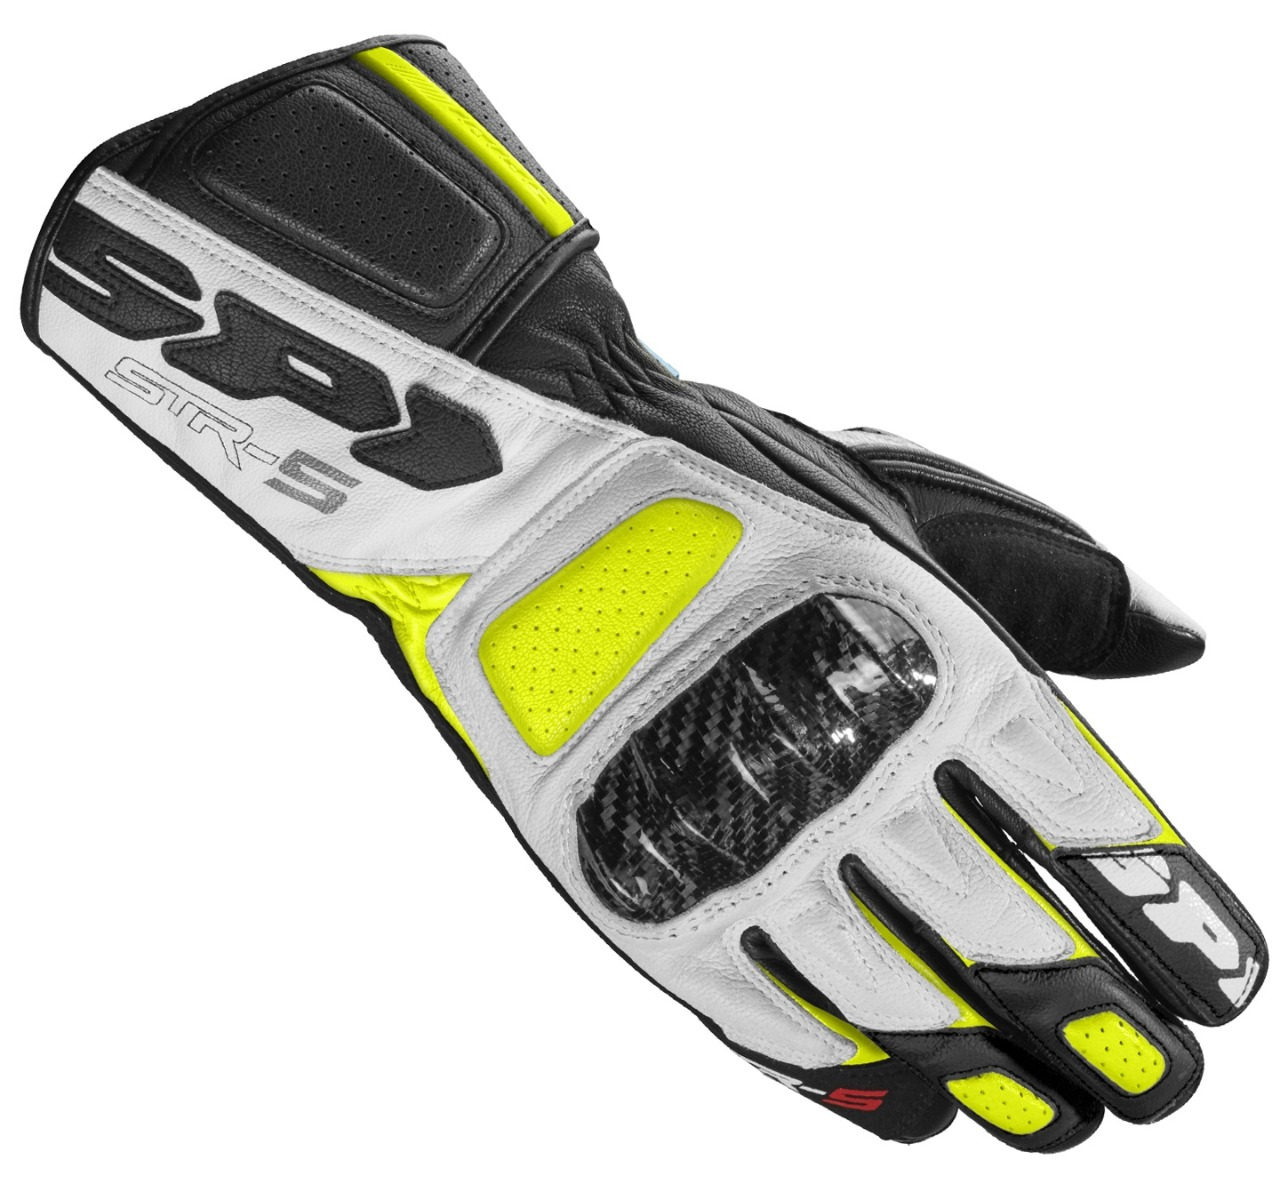 Spidi STR-5 Black Fluo Yellow M